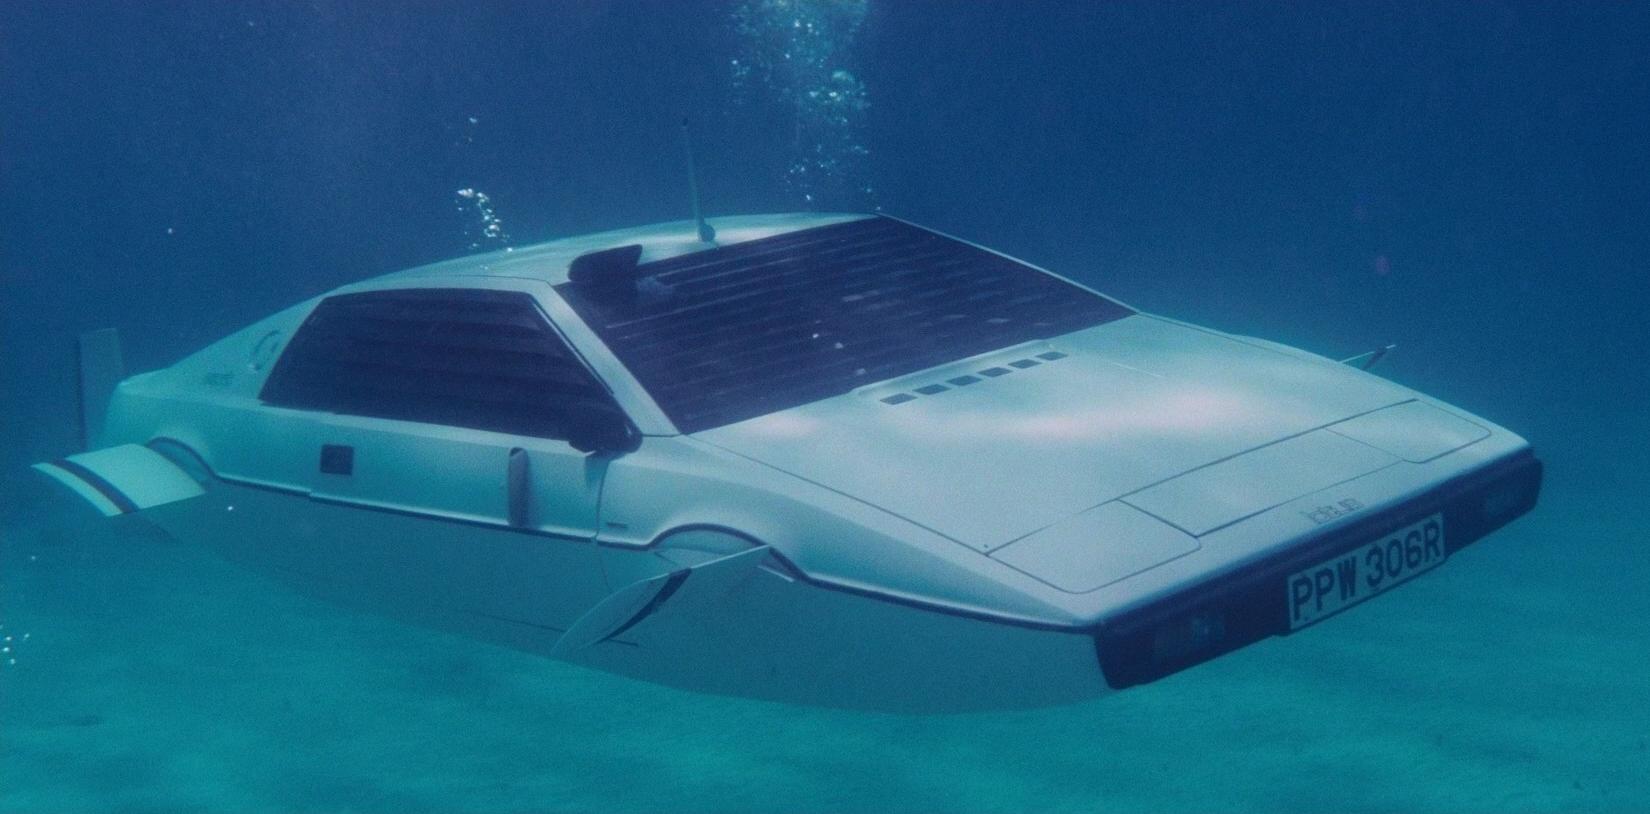 Lotus Esprit S1 (1976) | James Bond Wiki | Fandom